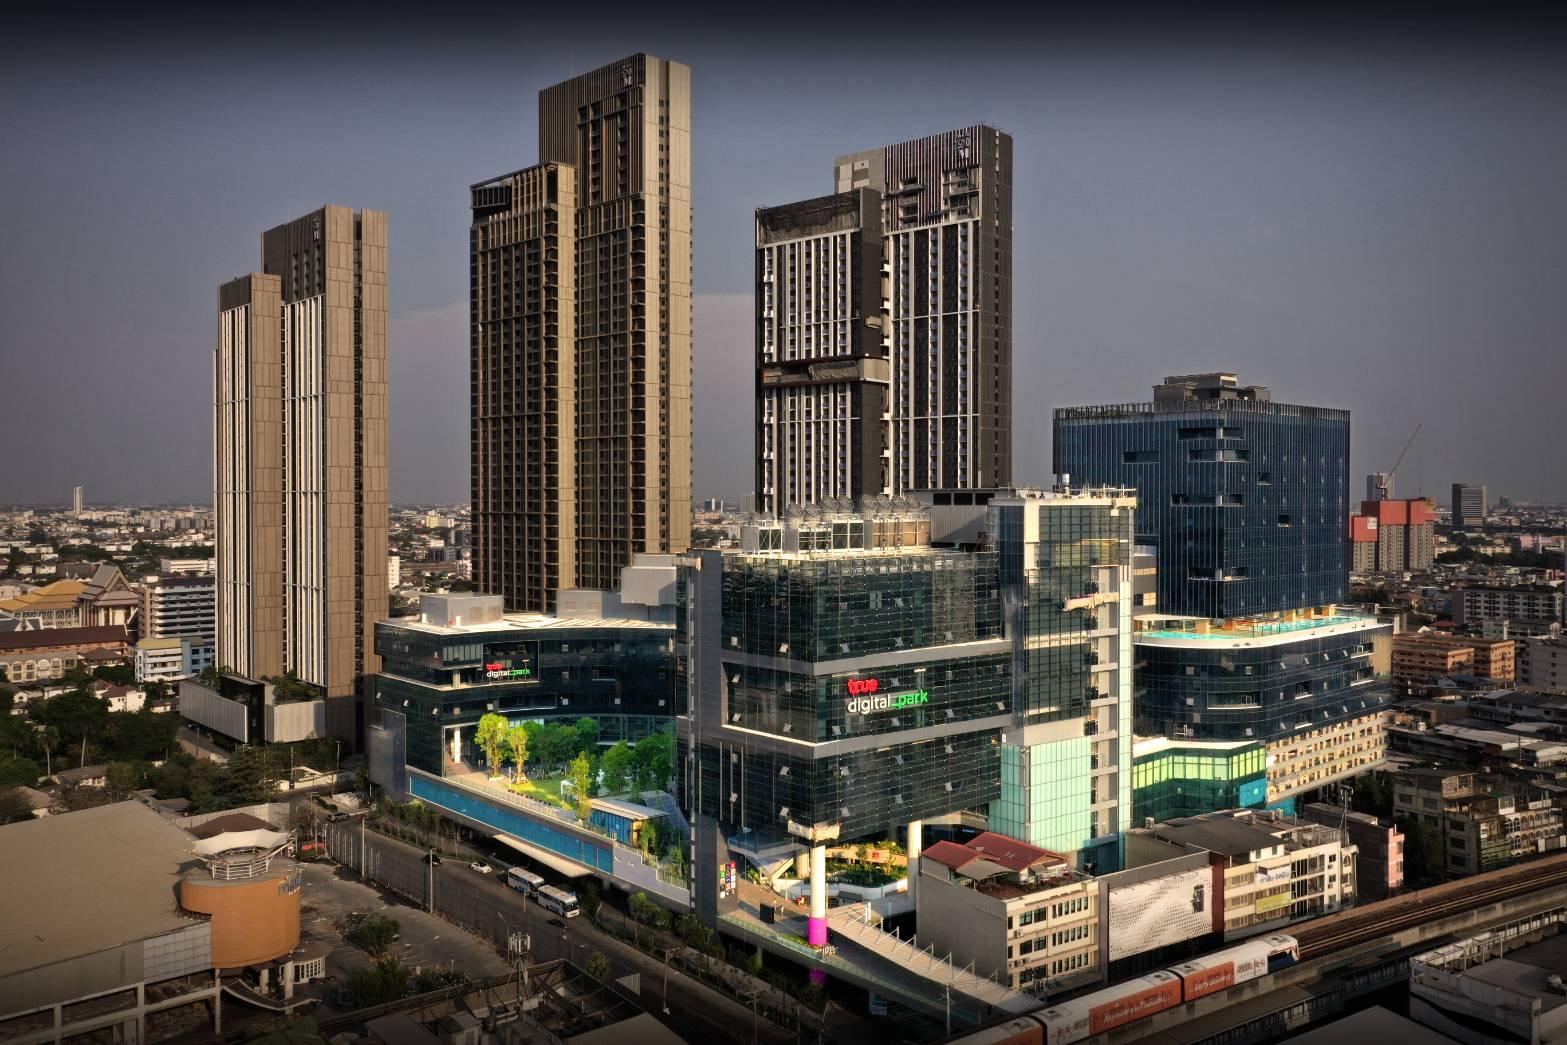 True Digital Park opens Work Space to ignite future Thai unicorns